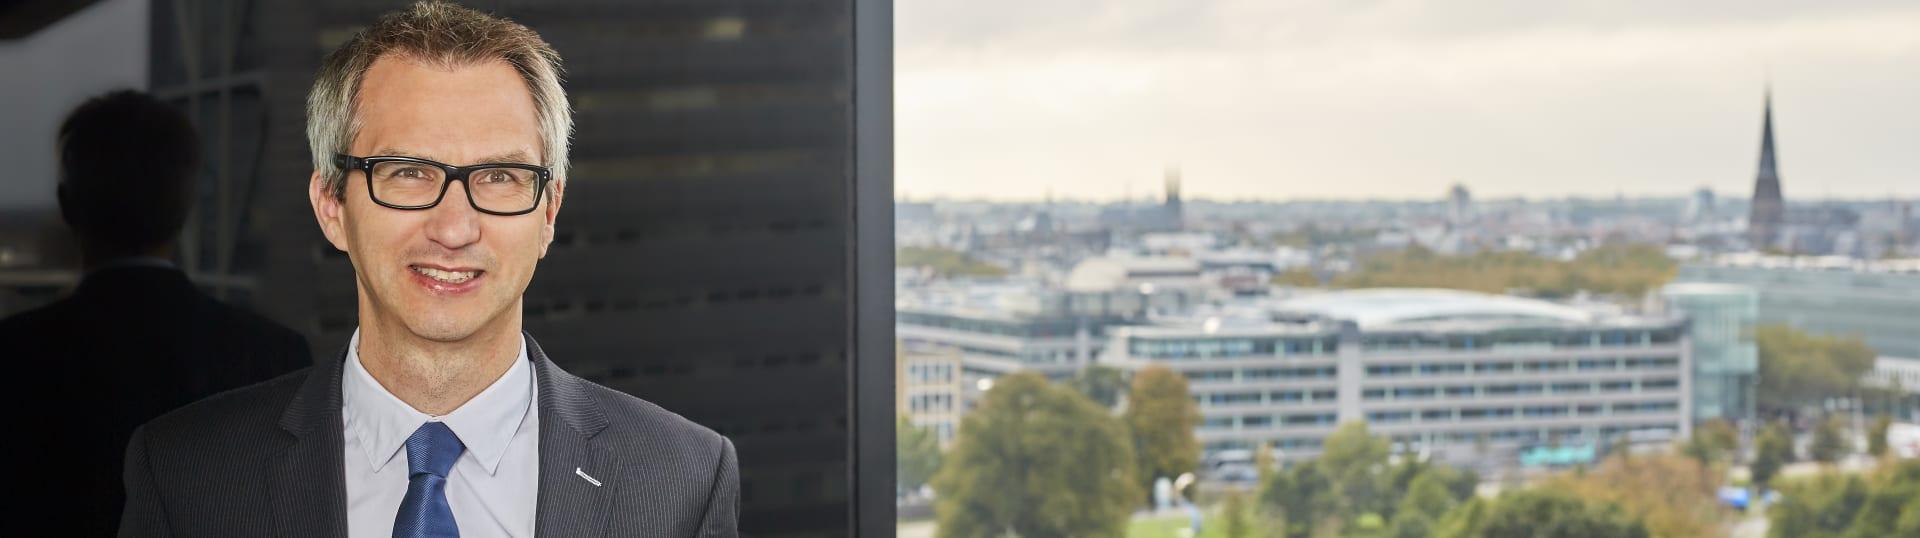 Martijn Kloppenburg, advocaat Pels Rijcken